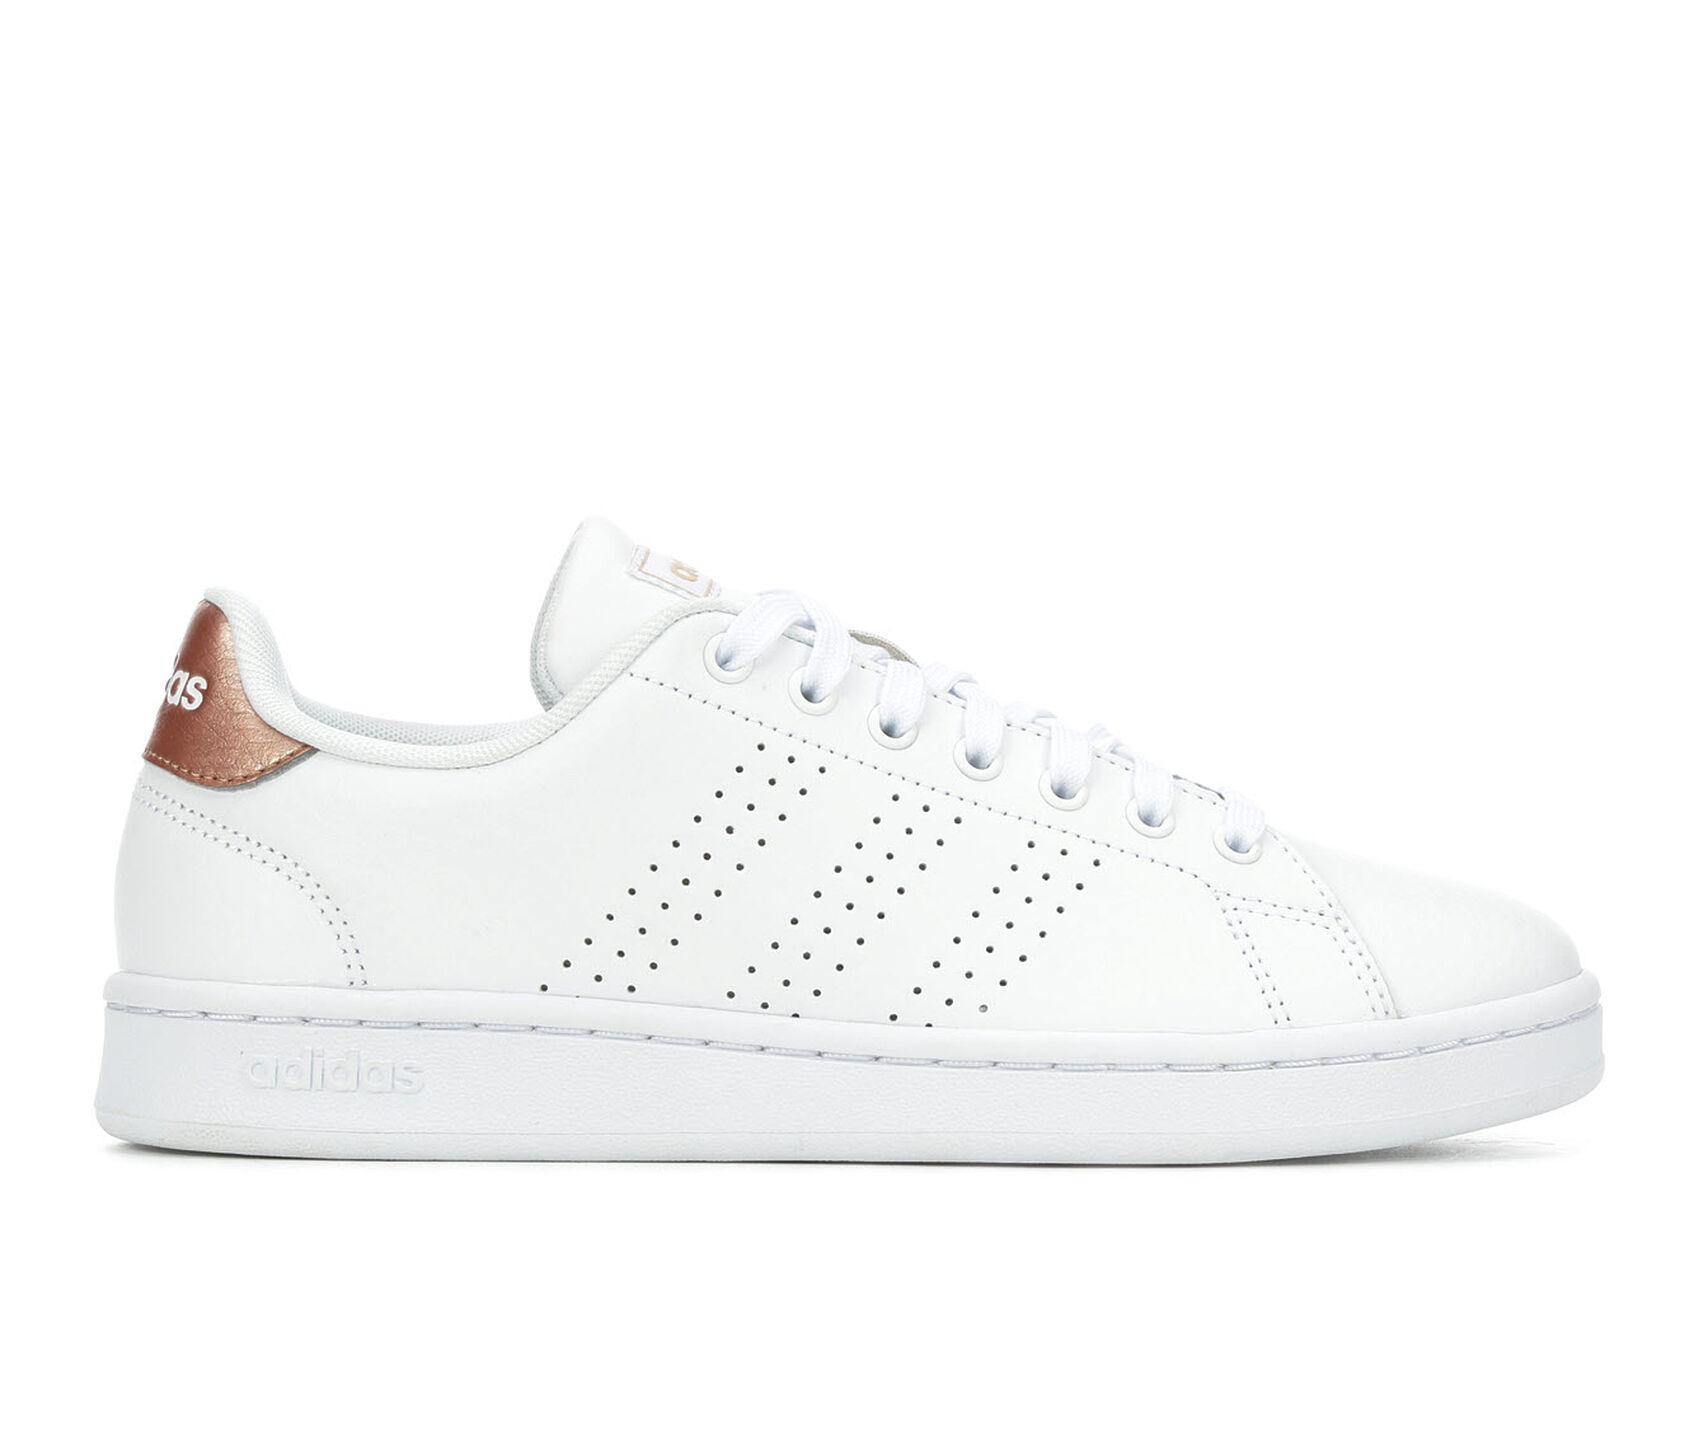 meilleures baskets 7e45b 32a7c Women's Adidas Advantage Clean Sneakers